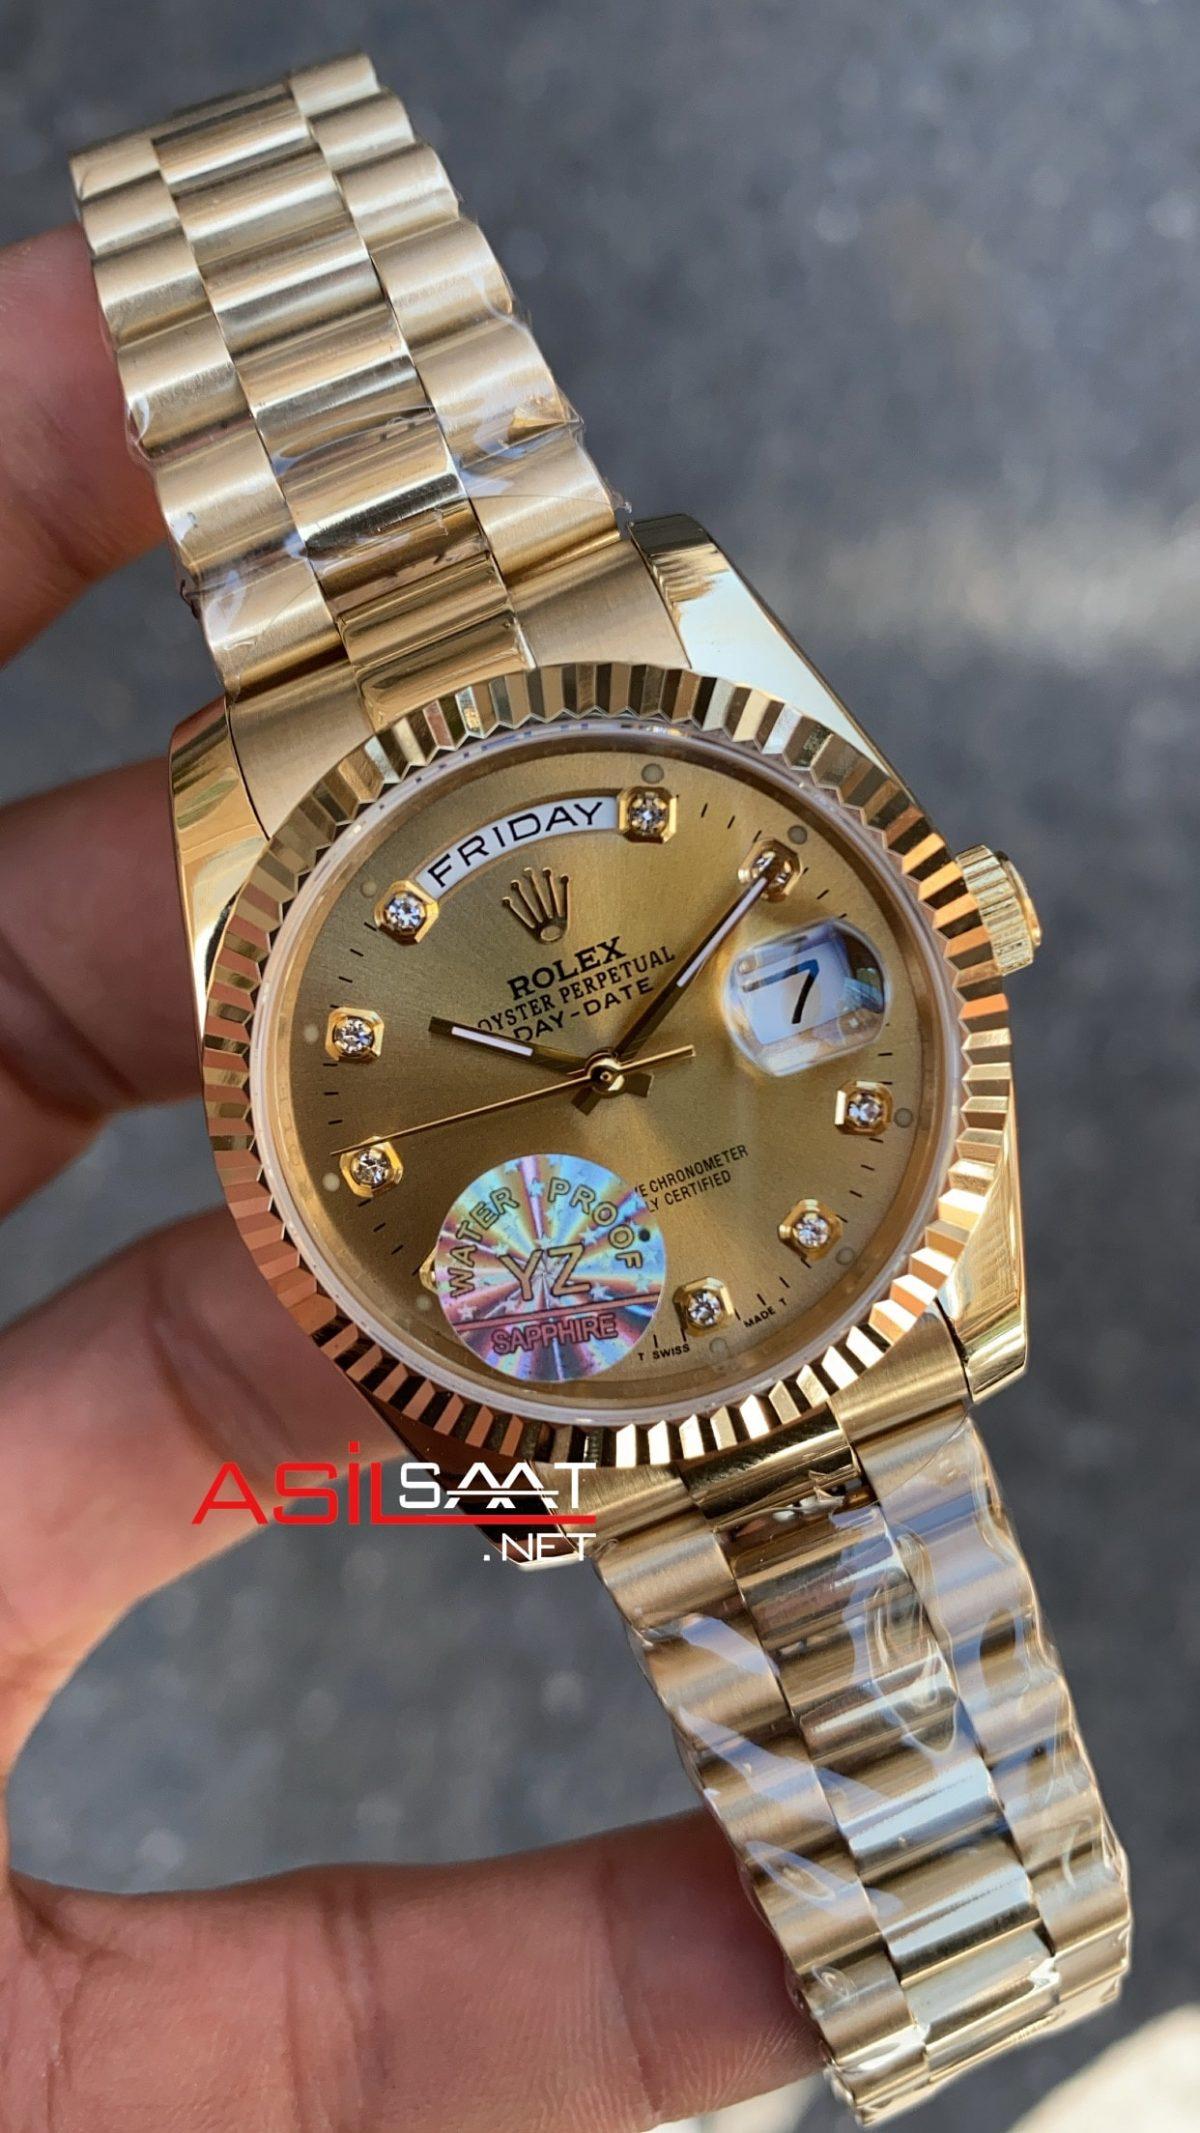 Rolex Day Date Yellow Bayan 36 mm 128238 RBA009